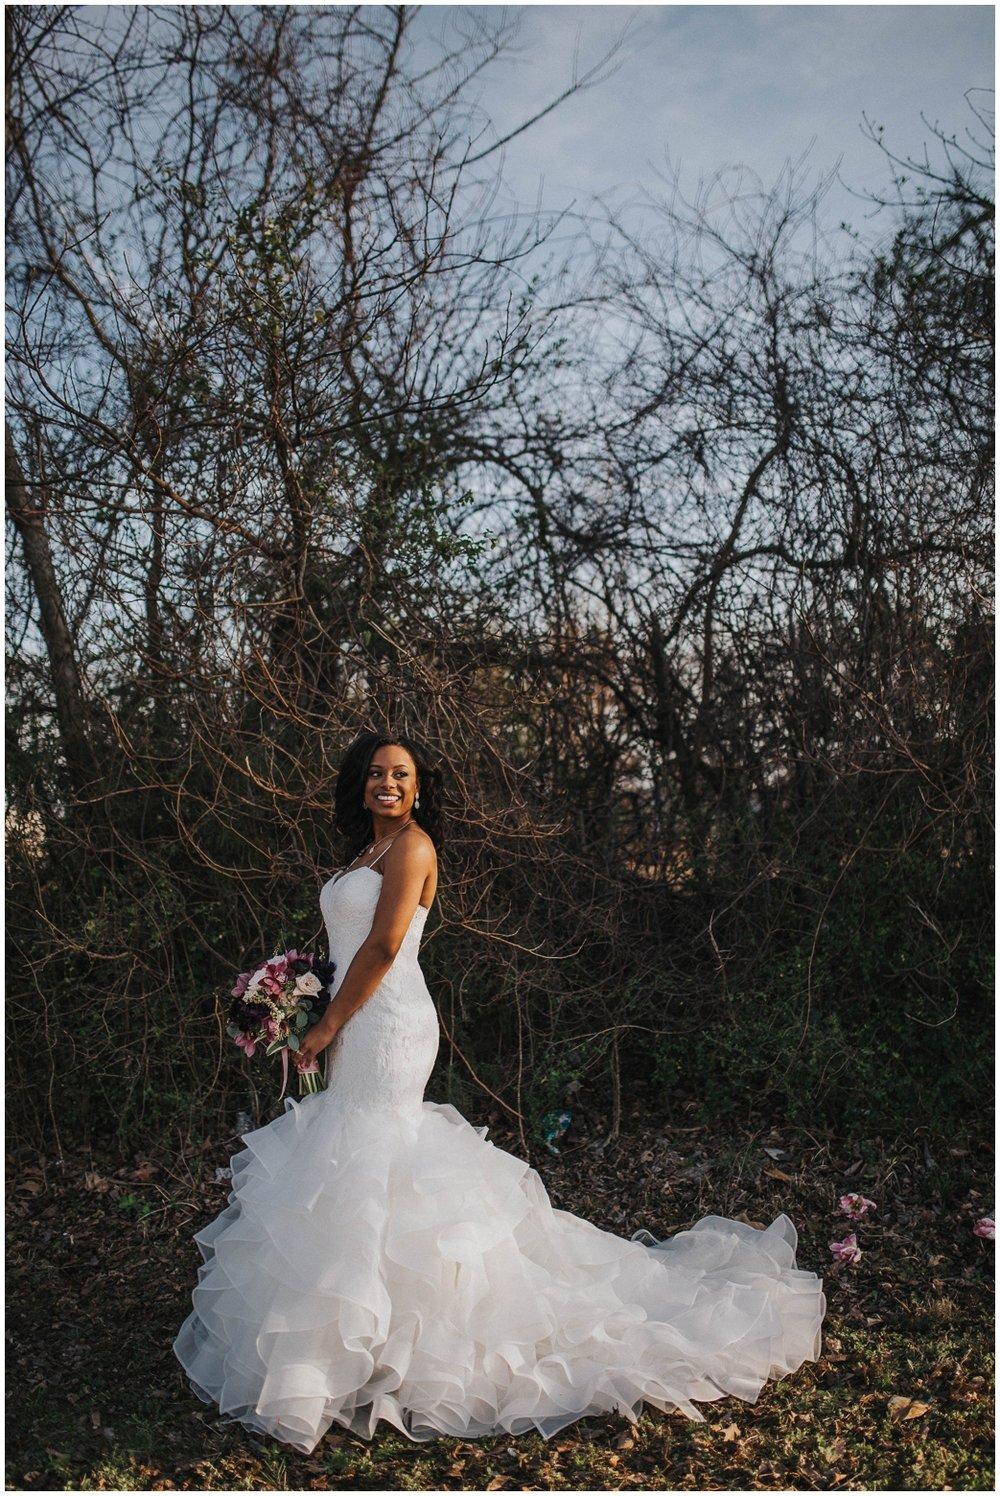 shipley_memphis_wedding_photographer_121.jpg